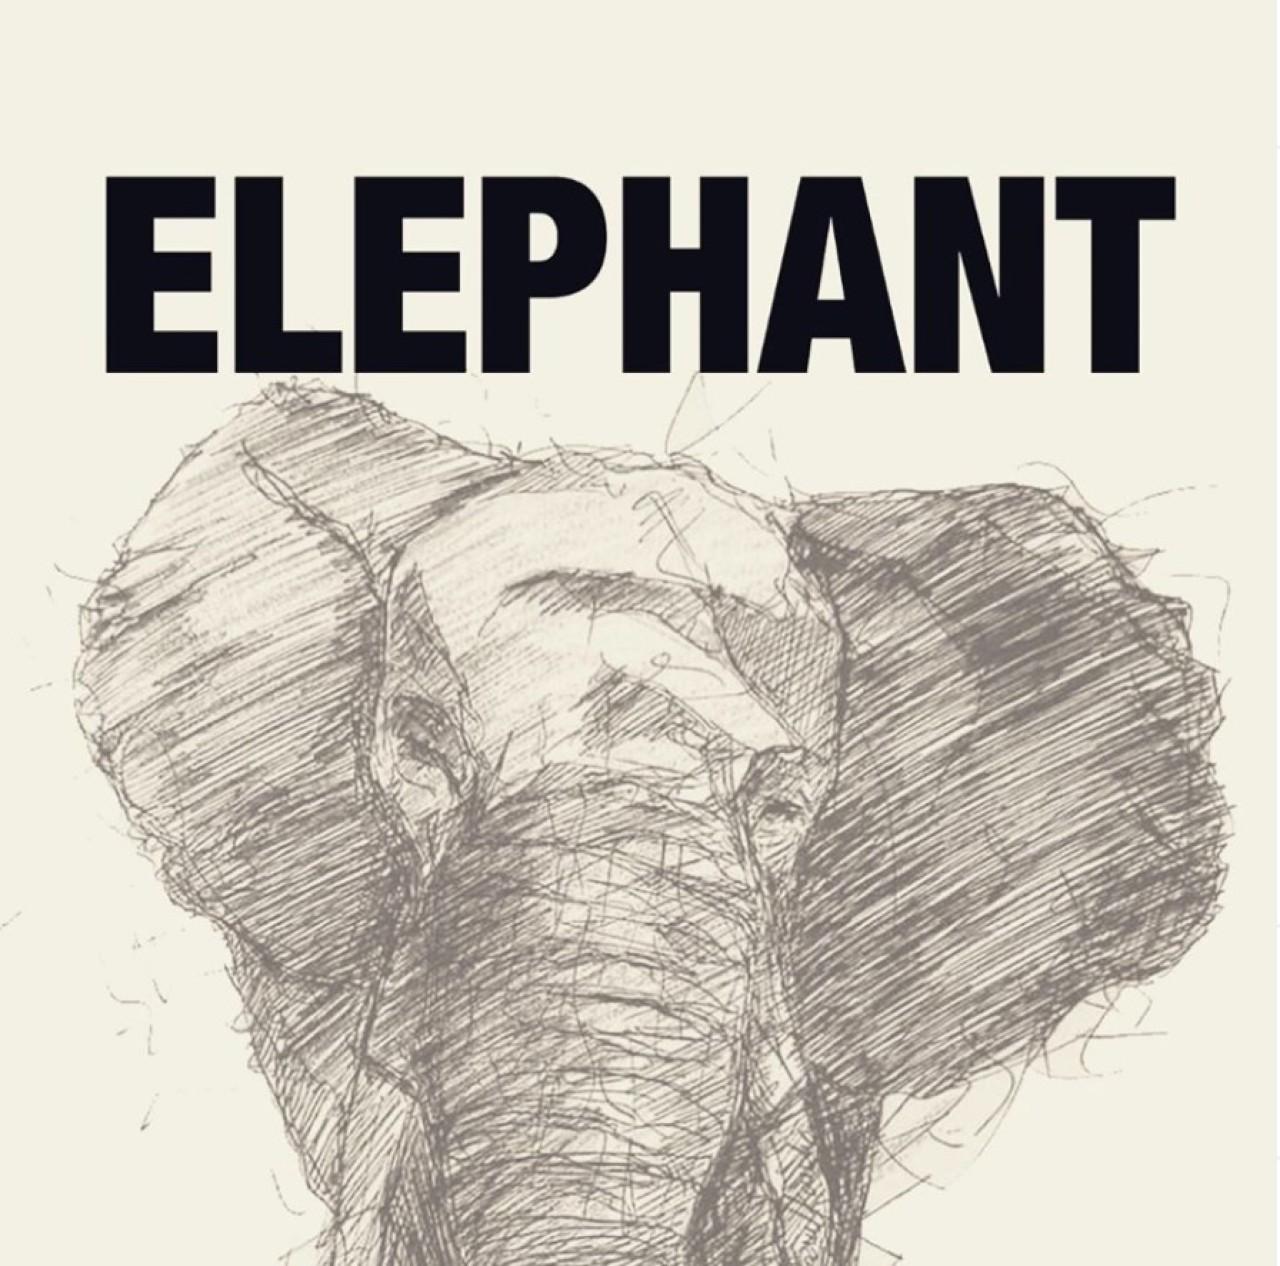 BAR ELEPHANT